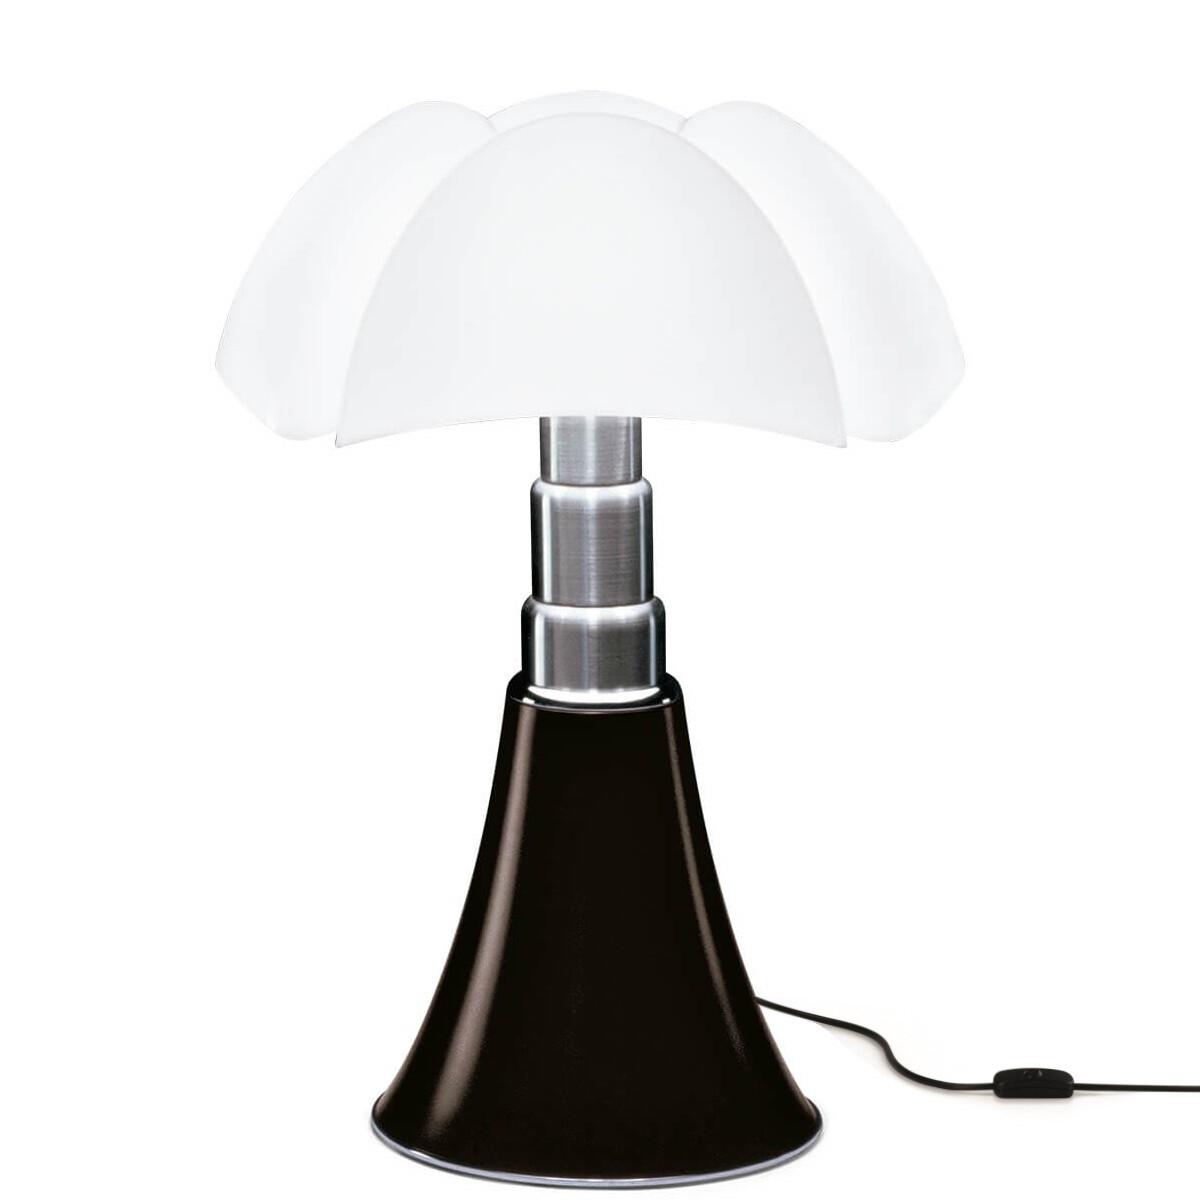 Image of Pipistrello Bordlampe LED Mørk Brun - Martinelli Luce (12697929)